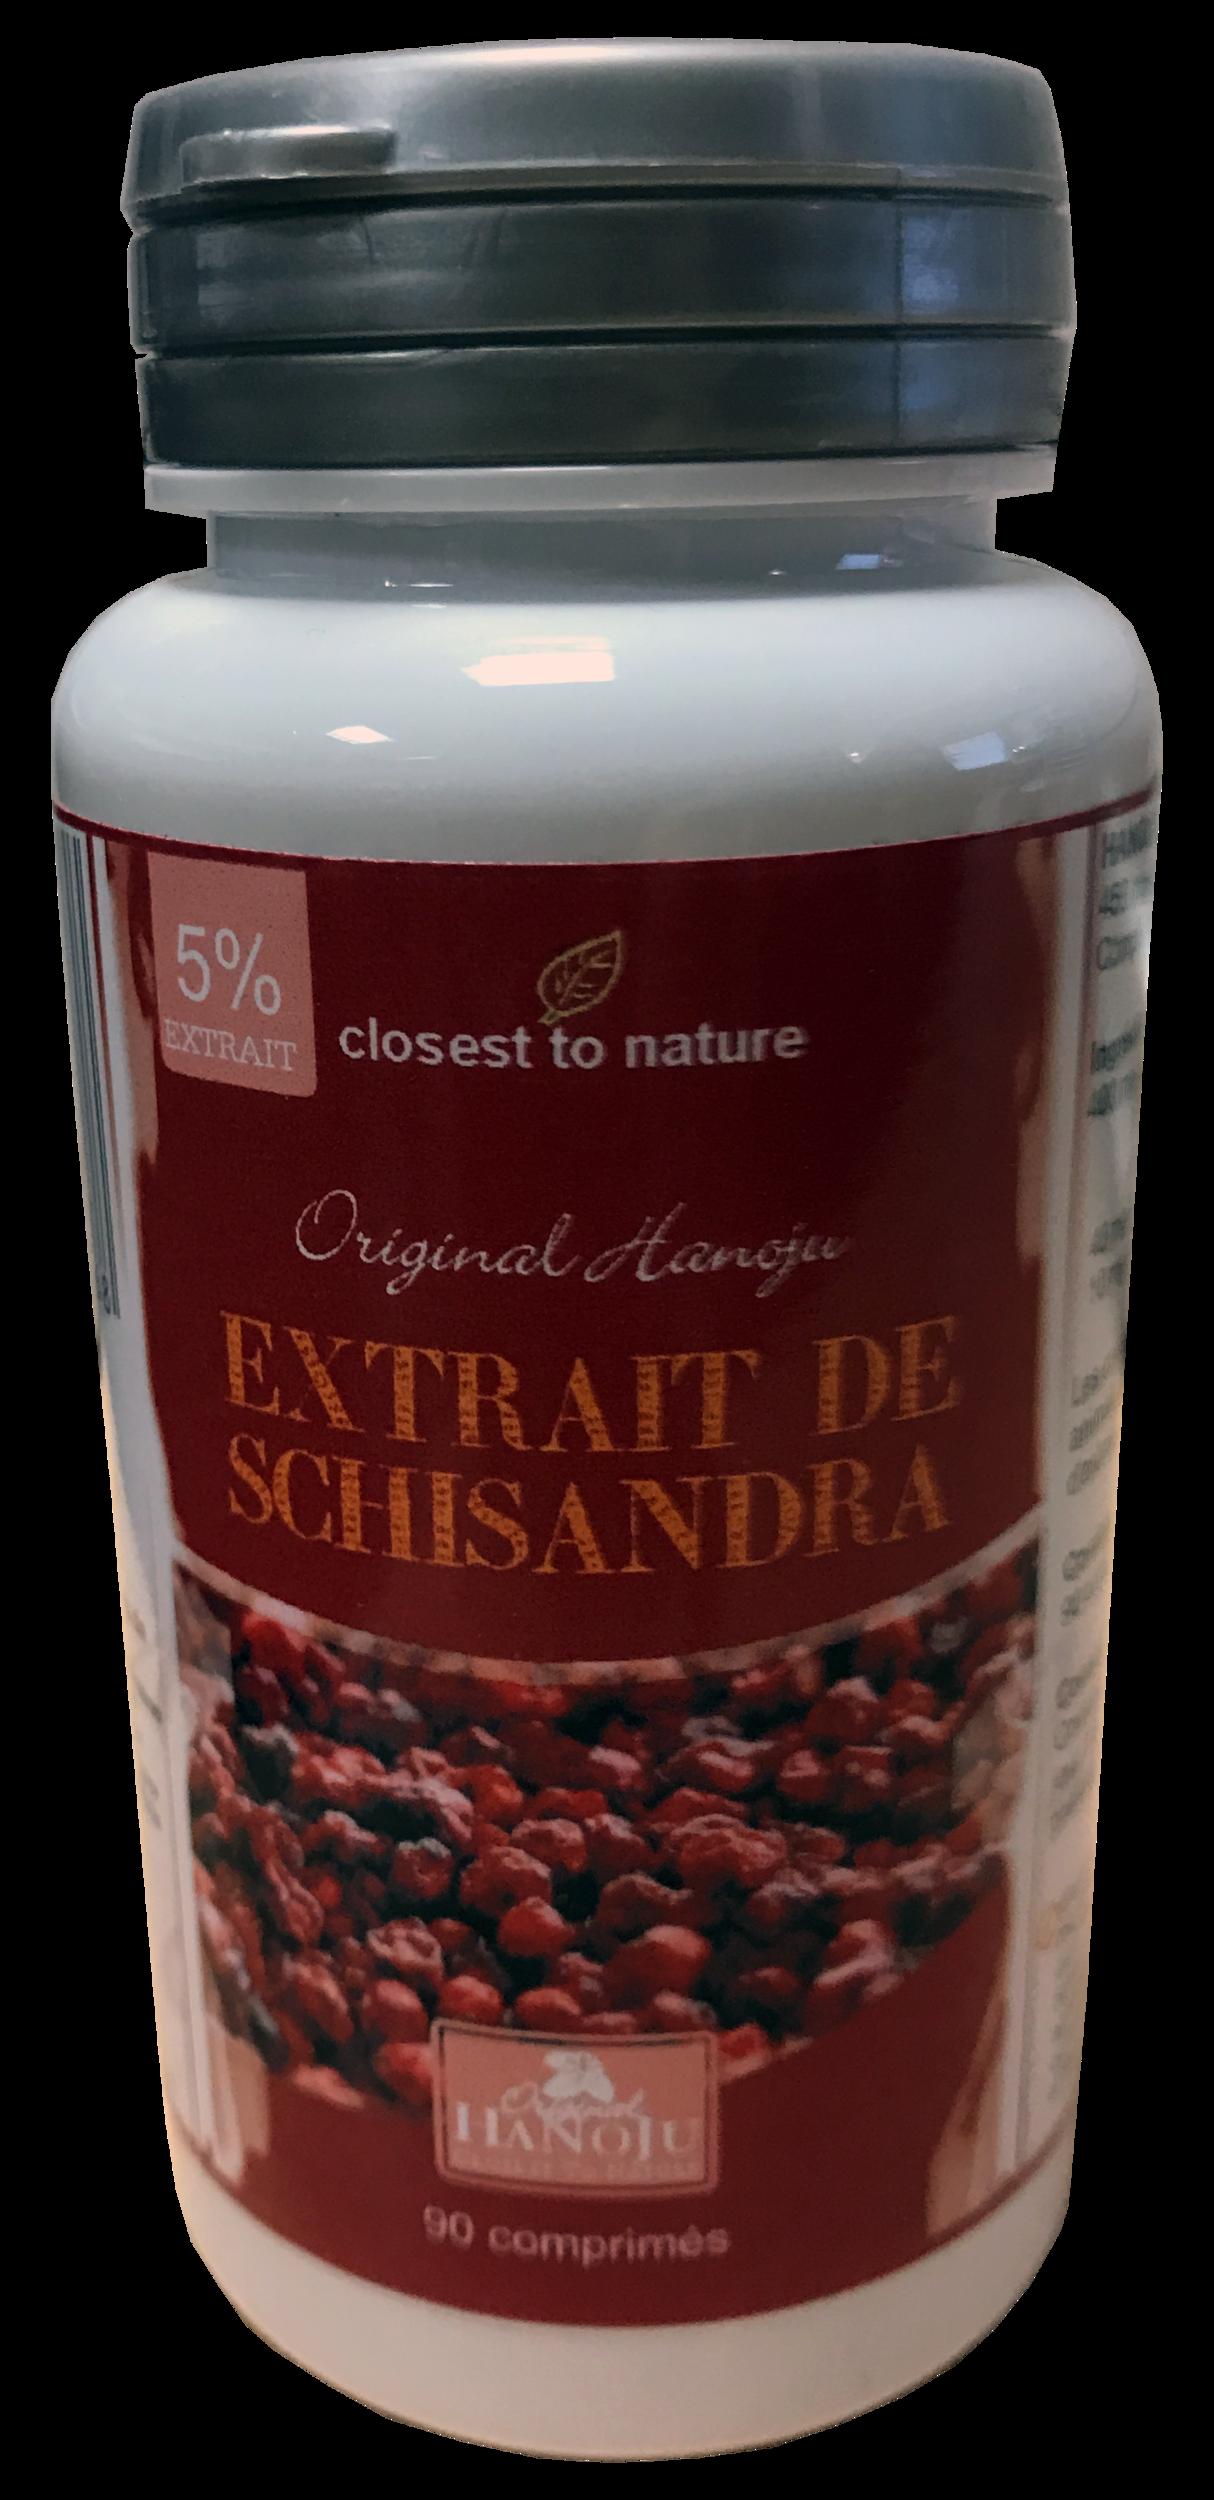 Extrait de Schisandra - 90 comprimés - 450 mg